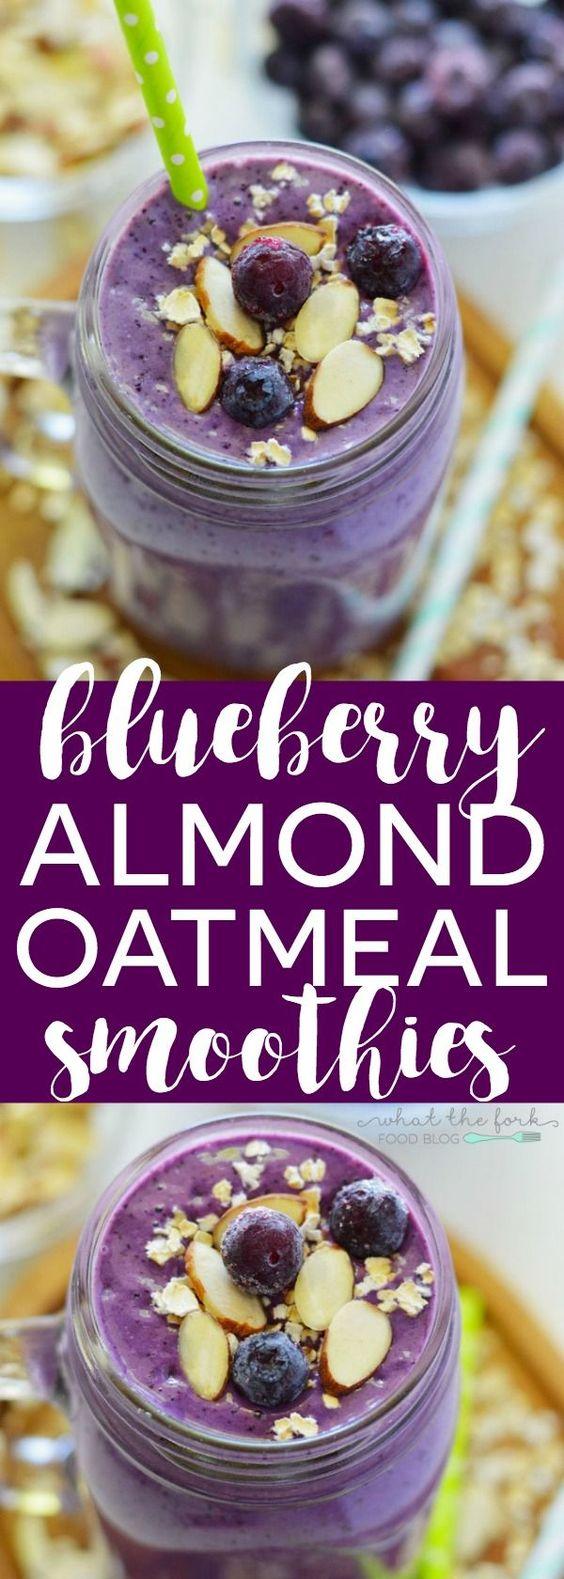 Blueberry Almond Oatmeal Smoothies | Recipe | Oatmeal Smoothies ...